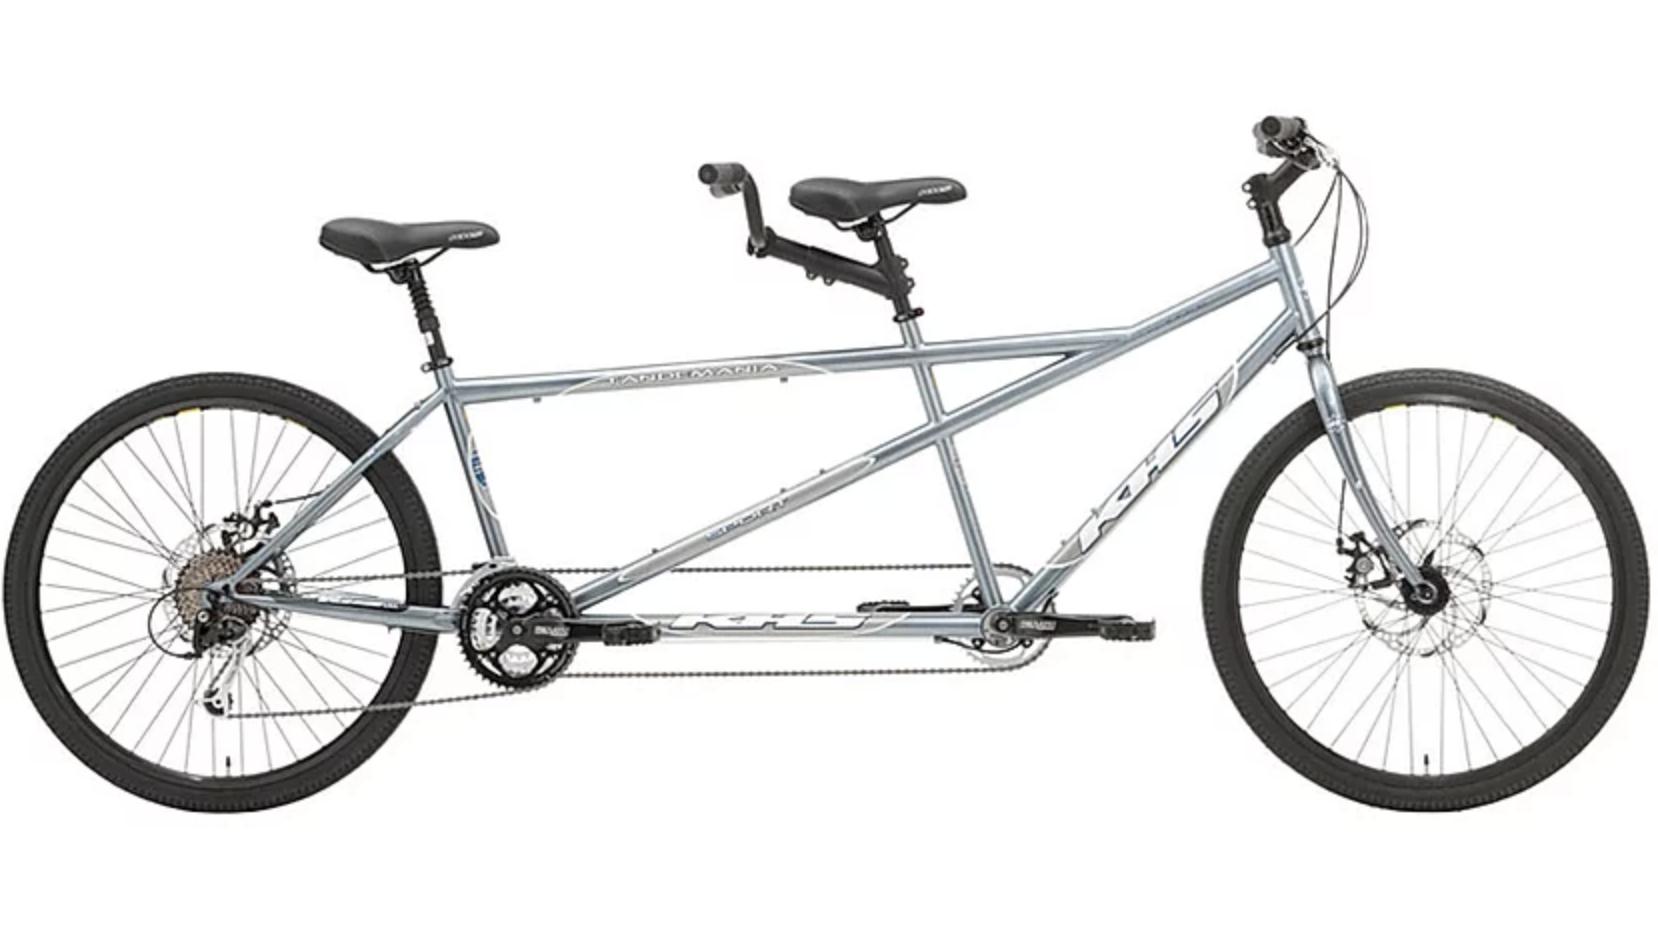 Tandem bike rental in dunedin, FL